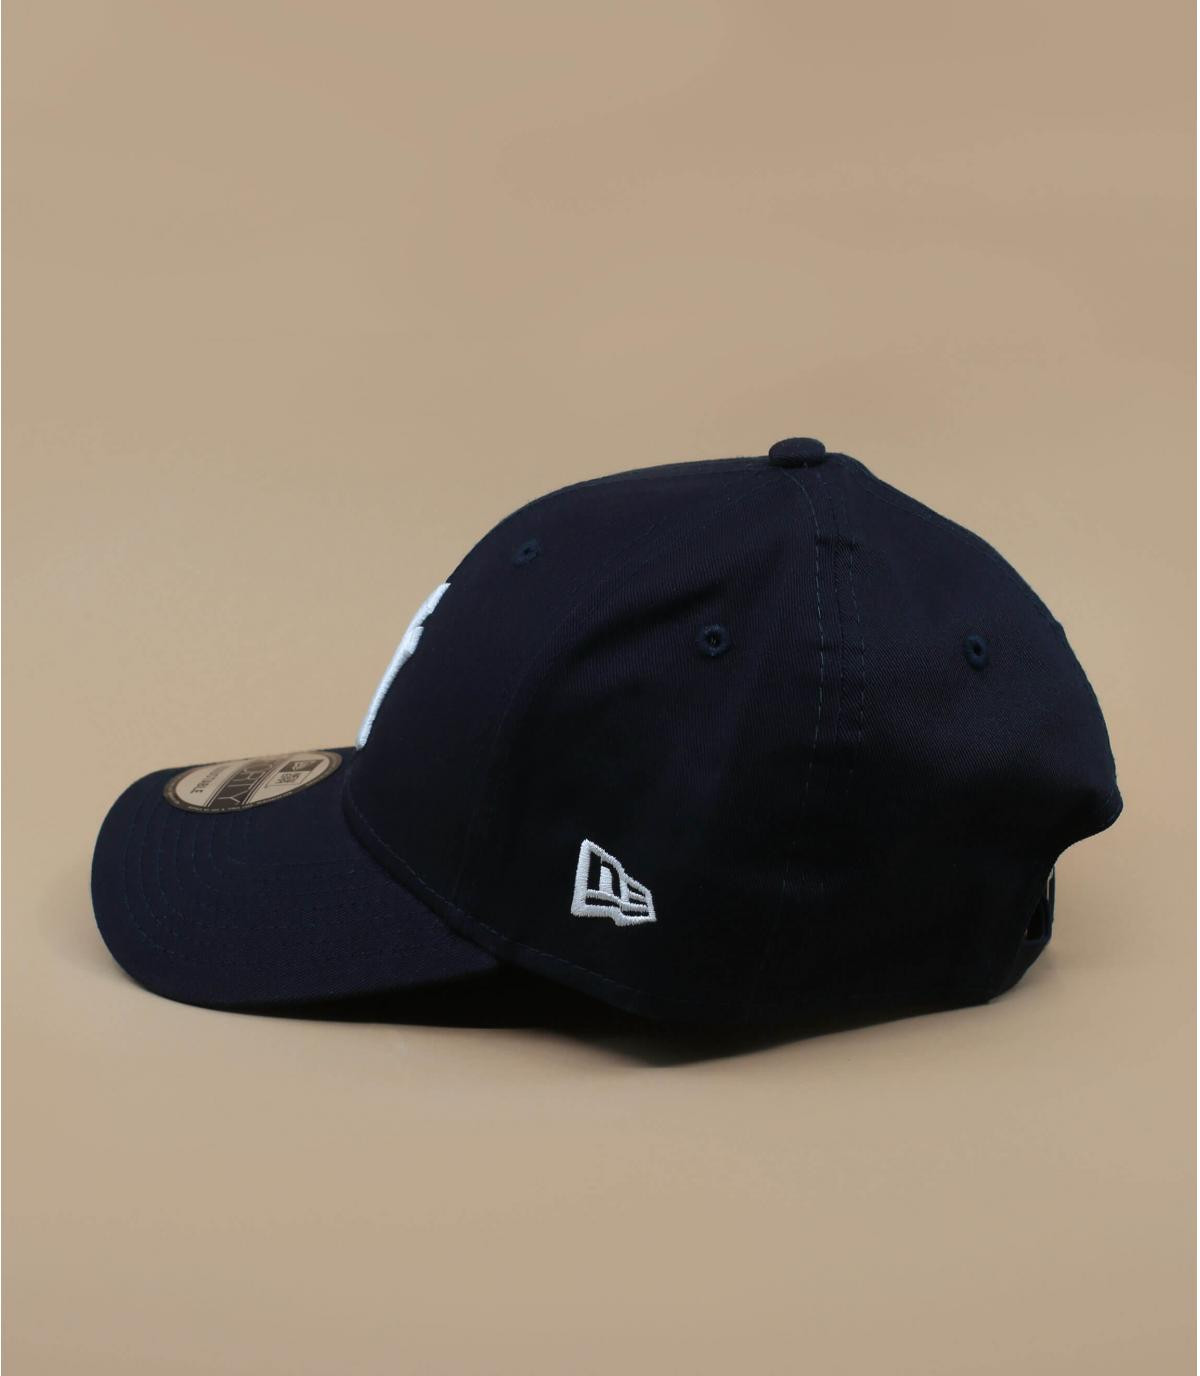 casquette ajustable bleu marine trucker ny navy ajustable par new era